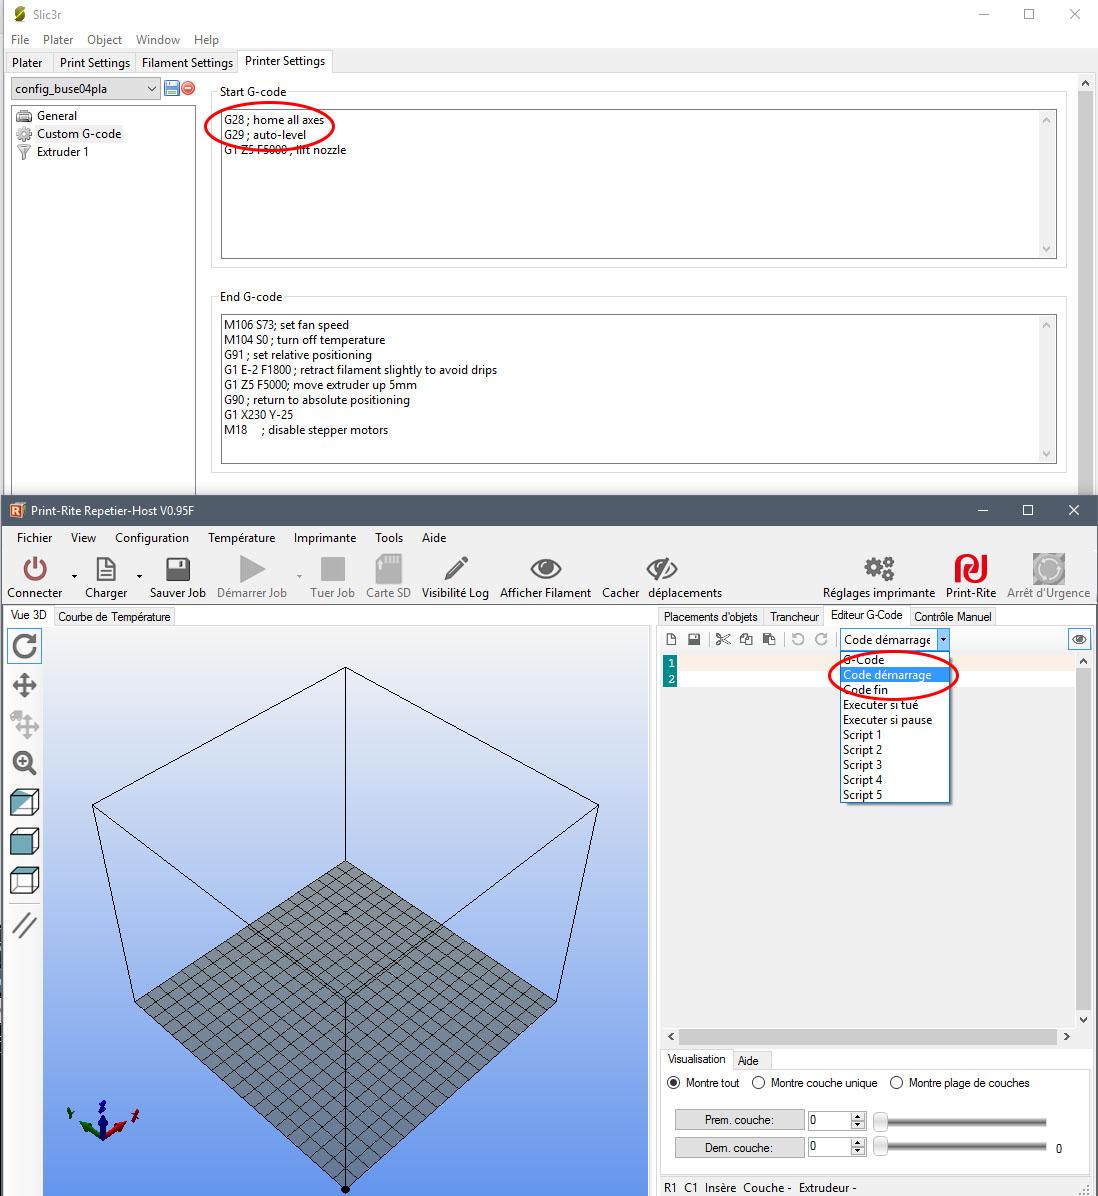 Print Rite Auto Level - General - PrintRite DIY 3D Printer